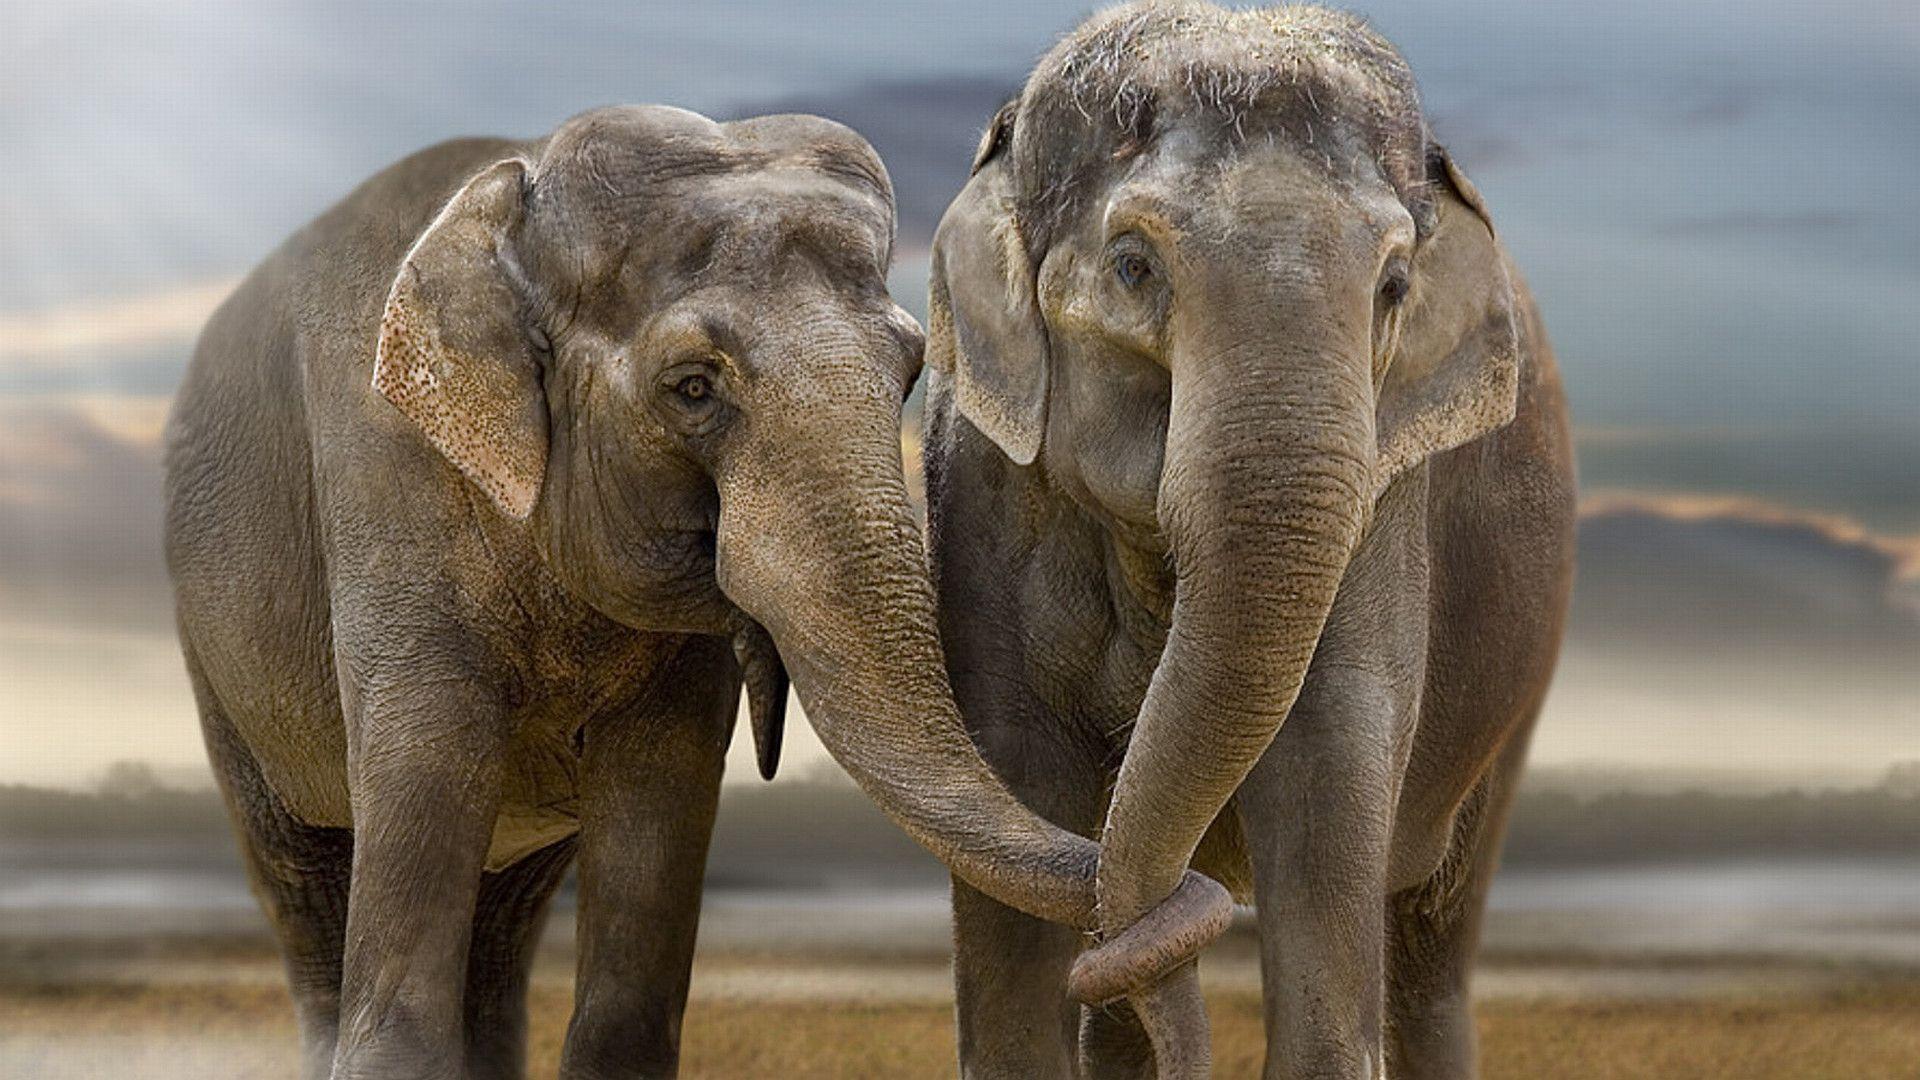 Wallpaper download elephant - Cute Elephant Desktop Wallpaper Pics Free Download Lashwallpapers